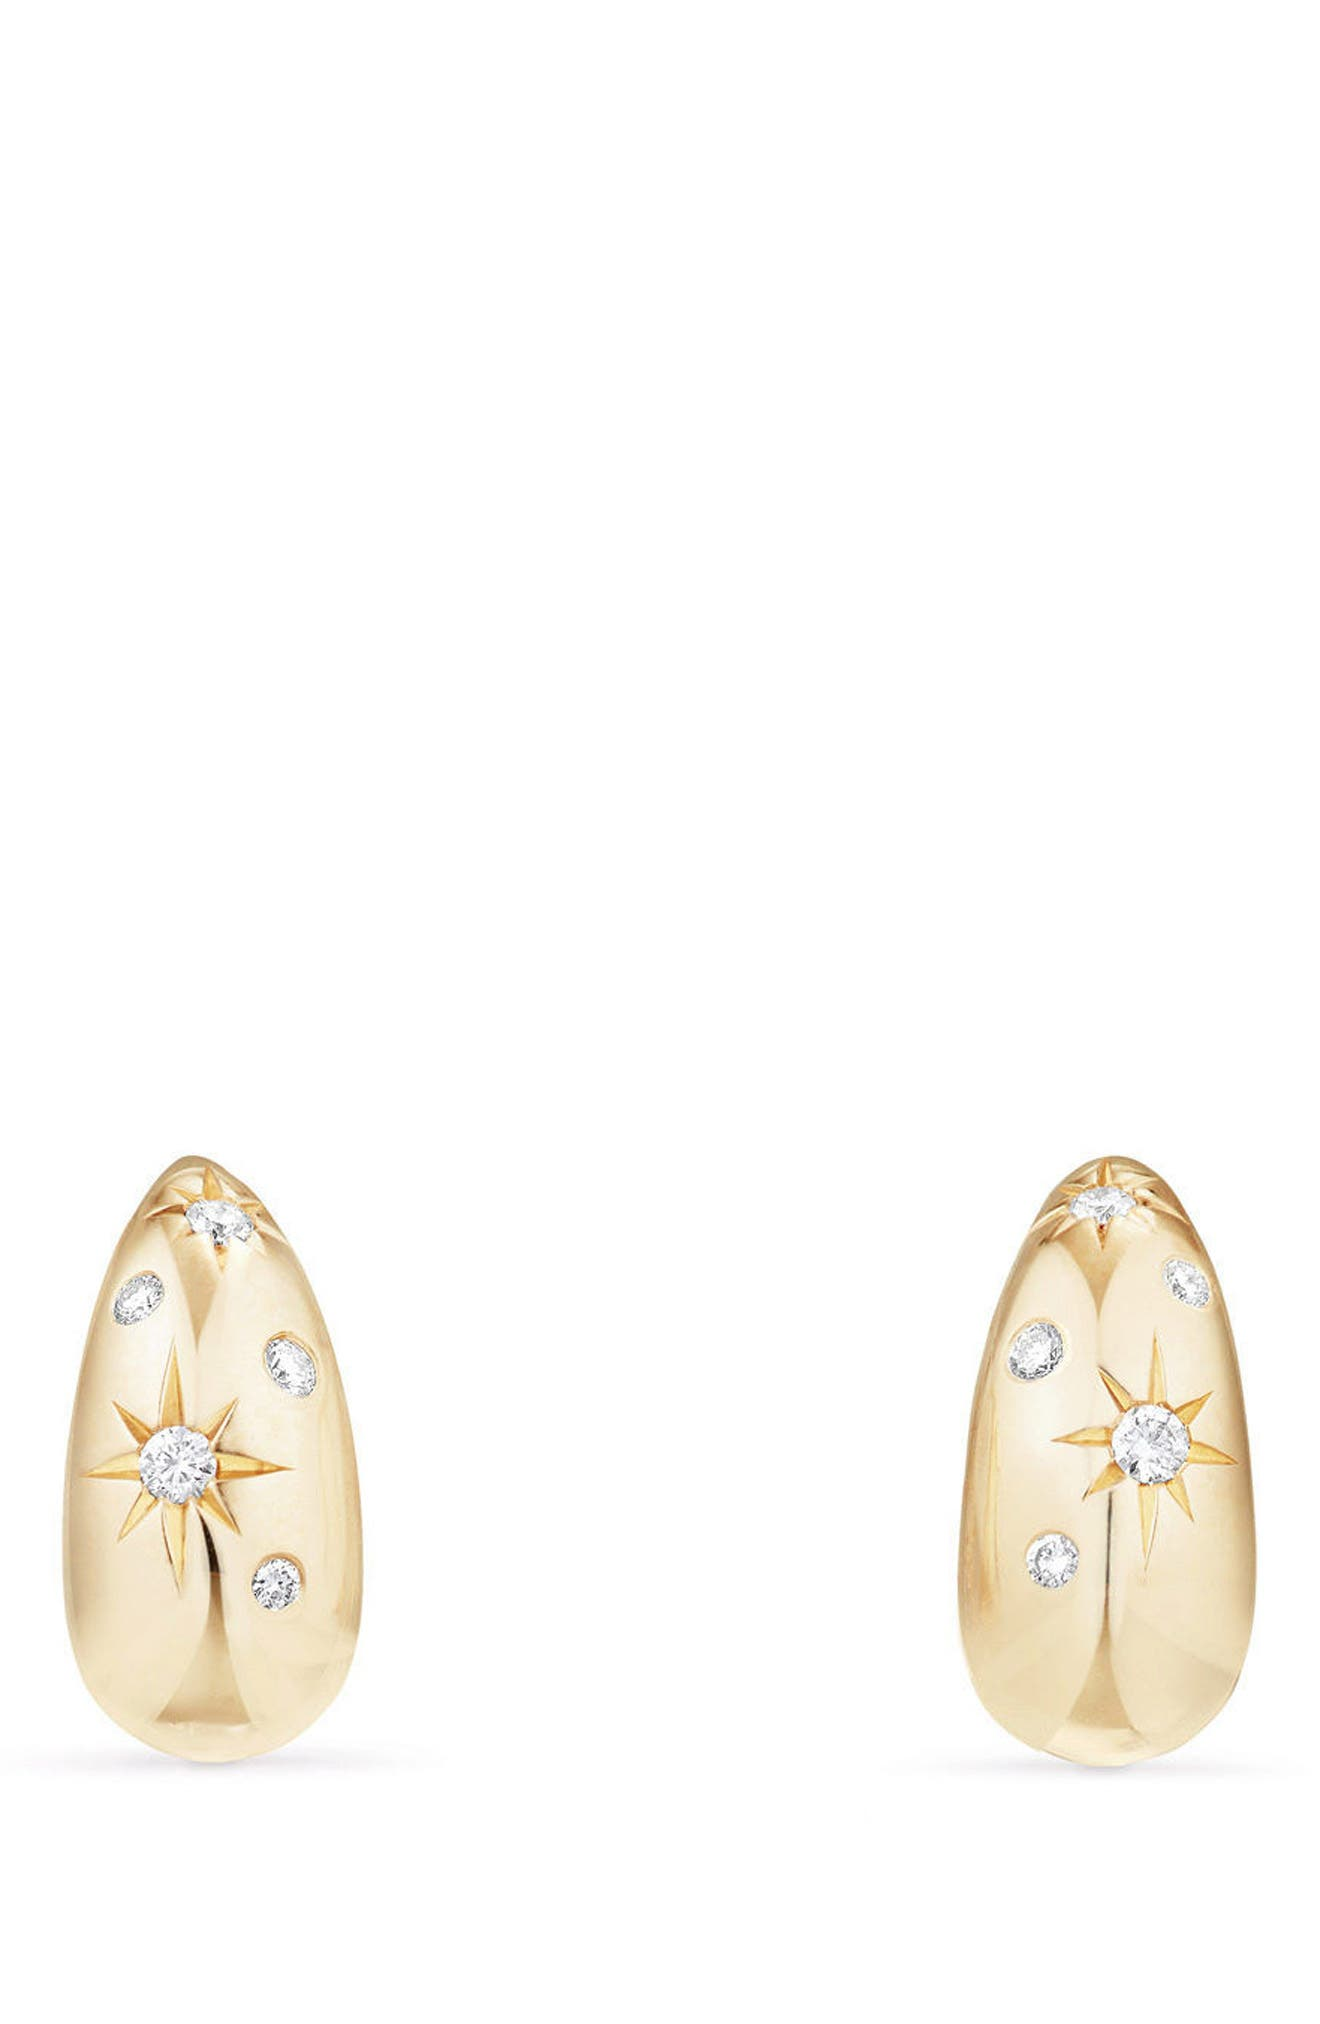 Main Image - David Yurman Pure Form Pod Earrings with Diamonds in 18K Gold, 15mm